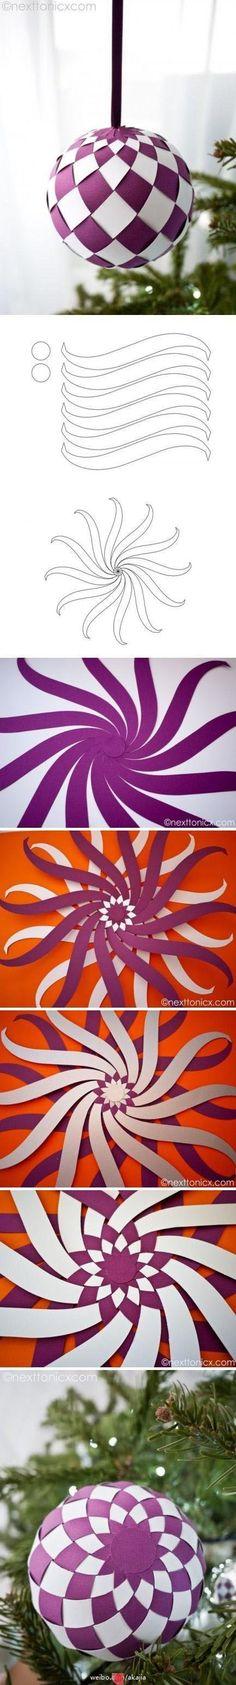 DIY ● Tutorial ● Woven paper baubles: